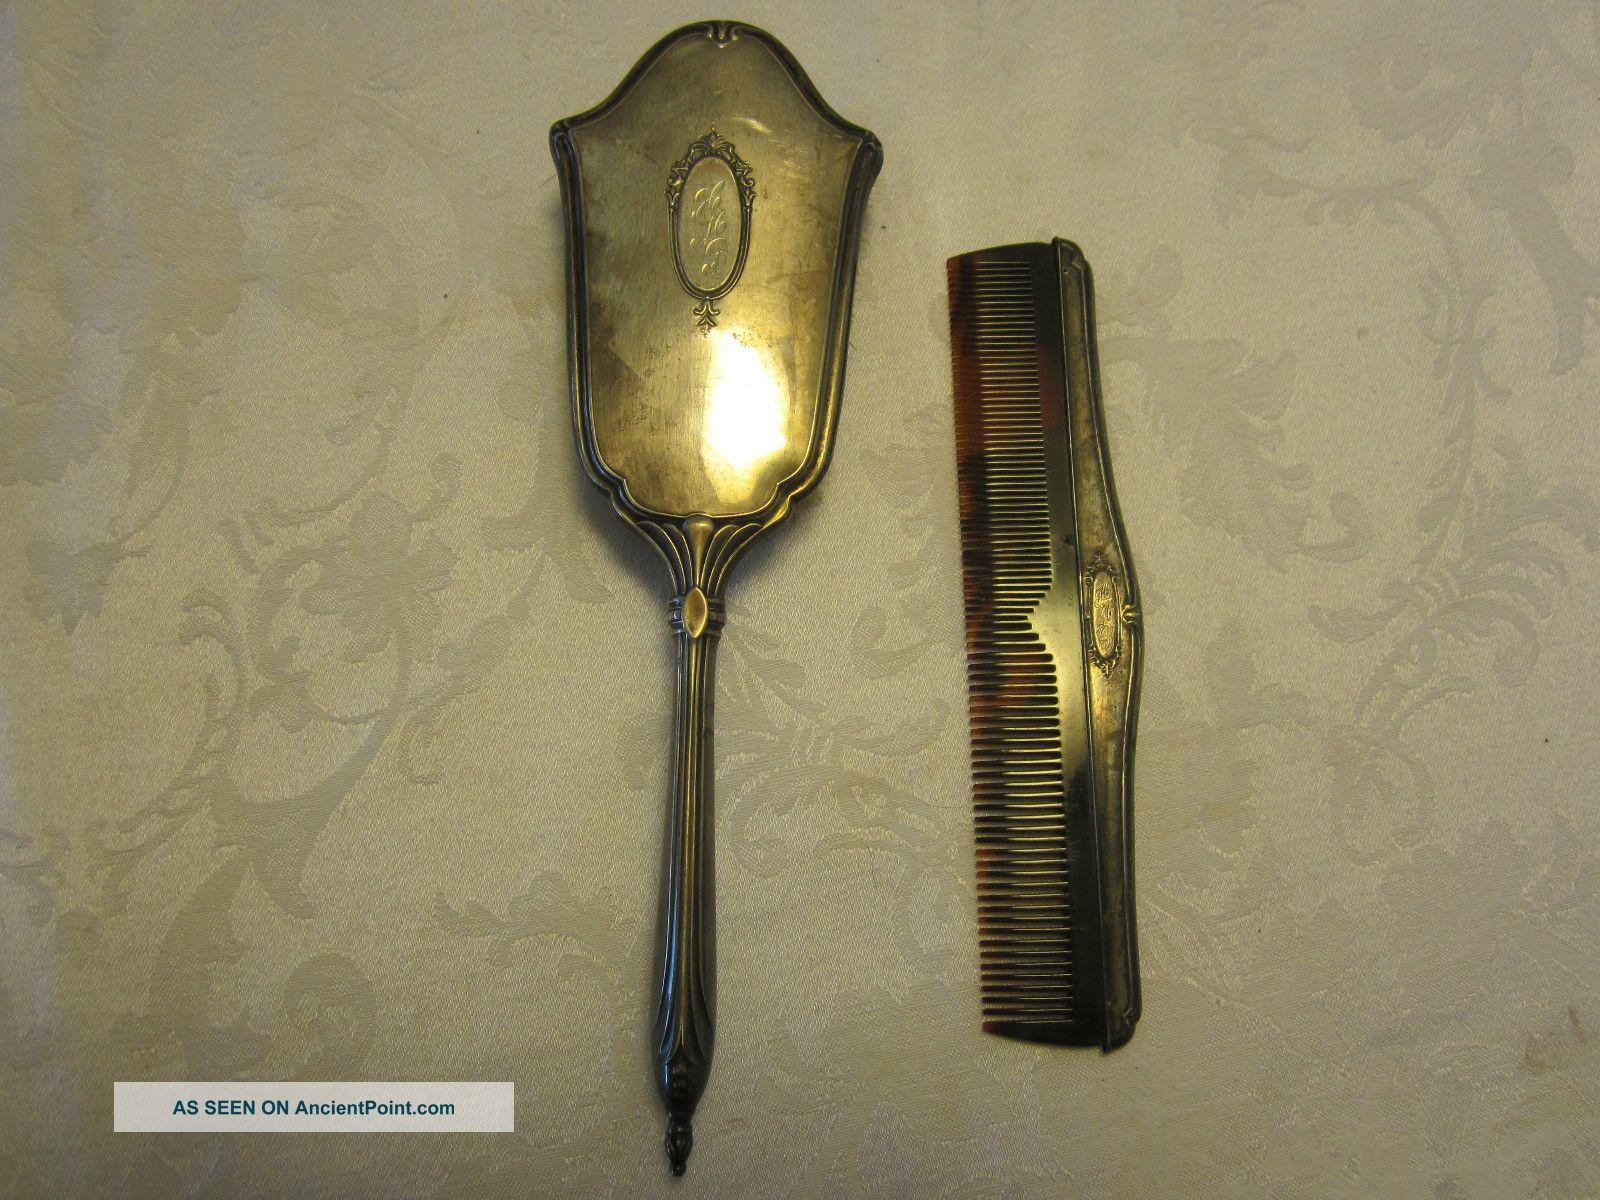 Antique Brush Comb Vanity Set Webster.  925 Sterling Silver Monogrammed Brushes & Grooming Sets photo